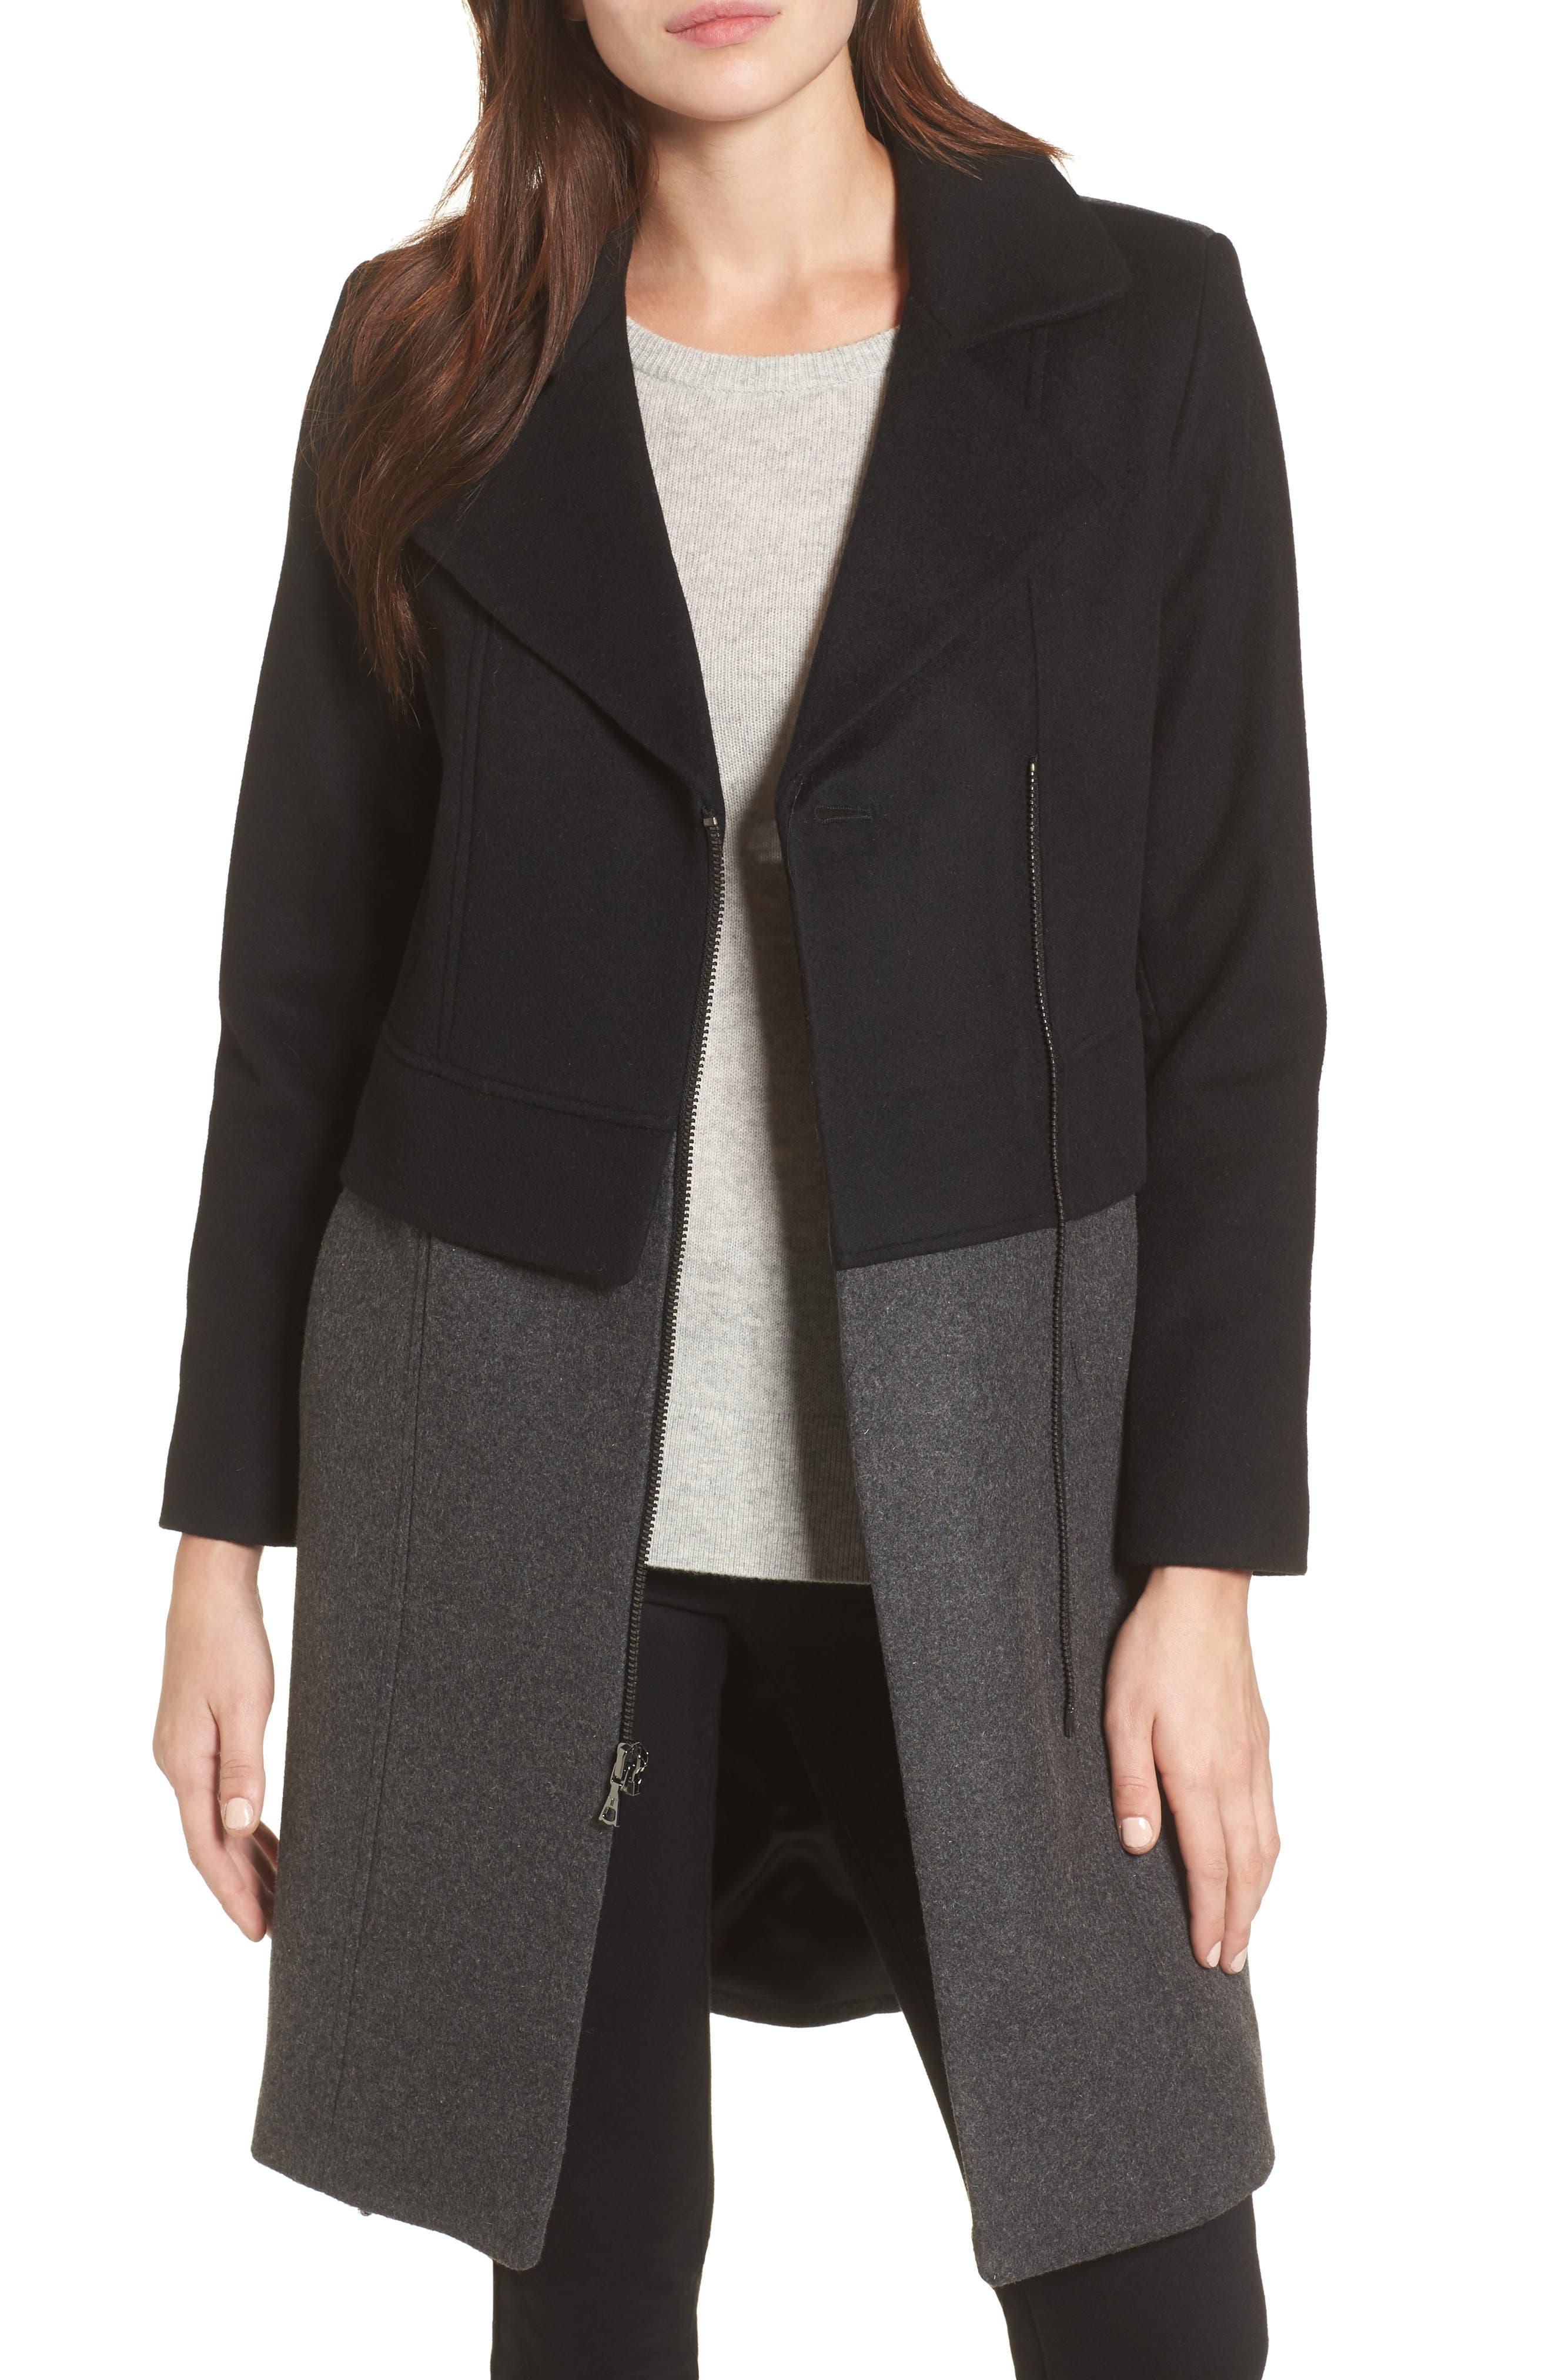 Brooklyn Colorblock Coat,                         Main,                         color, Grey/ Black